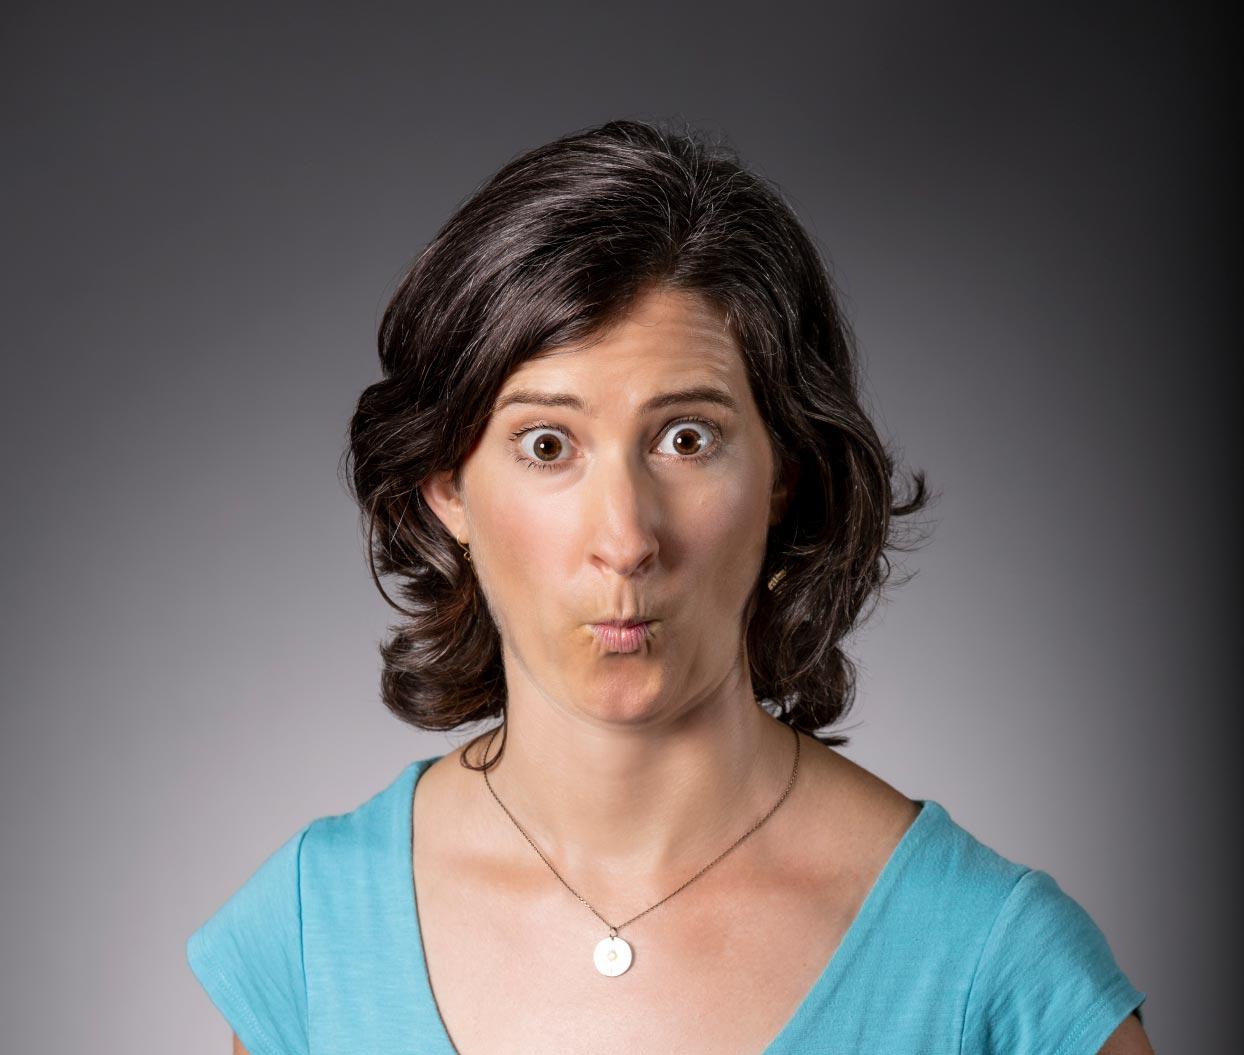 Julia Scott silly headshot